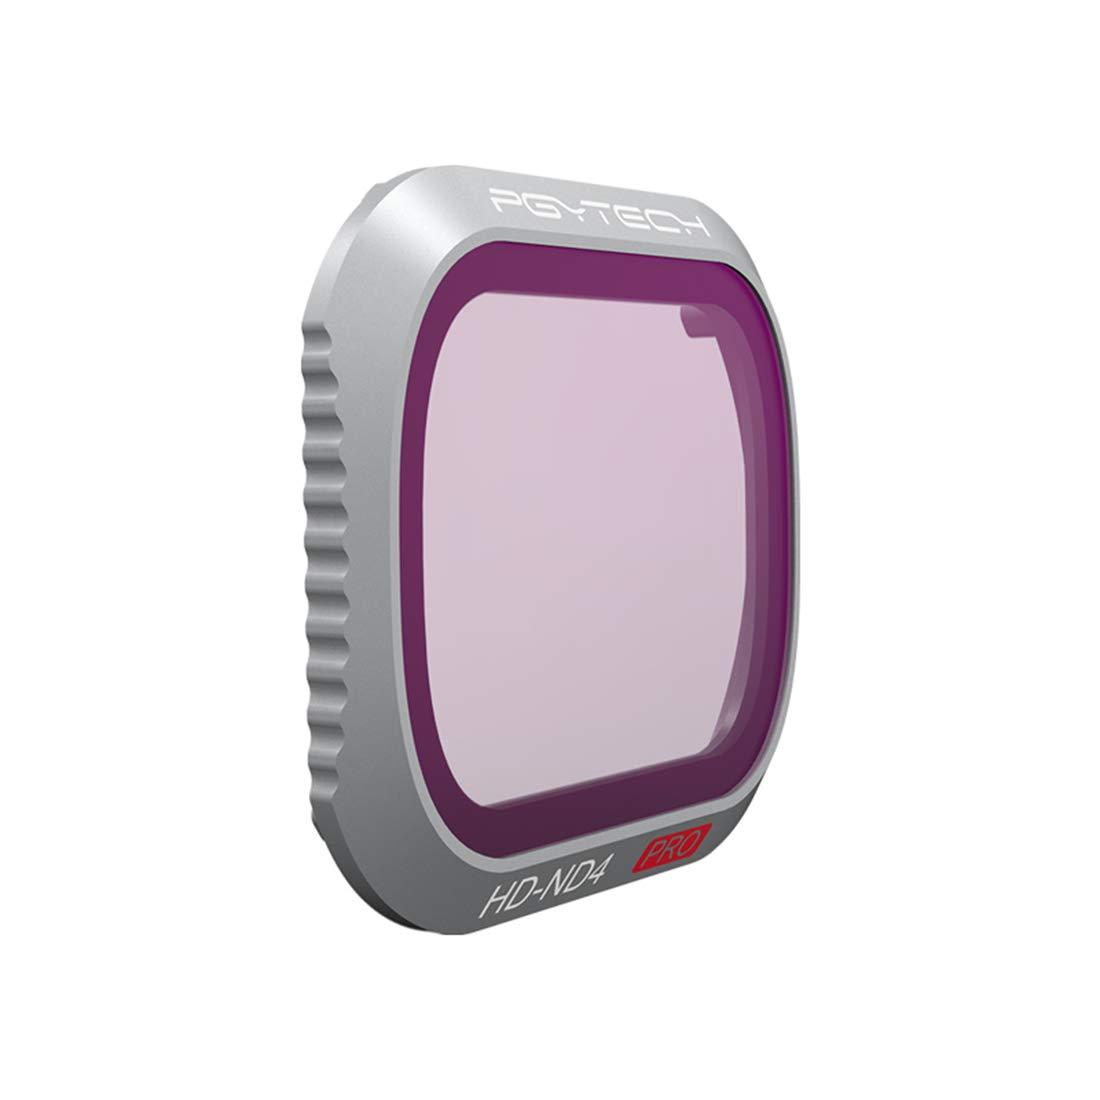 PeleusTech® PGYTECH MRC-CPL フィルター DJI Mavic 2 Pro ドローン用 1pcs 753517D1622V B07H5JKFJ7  Type-2 1pcs